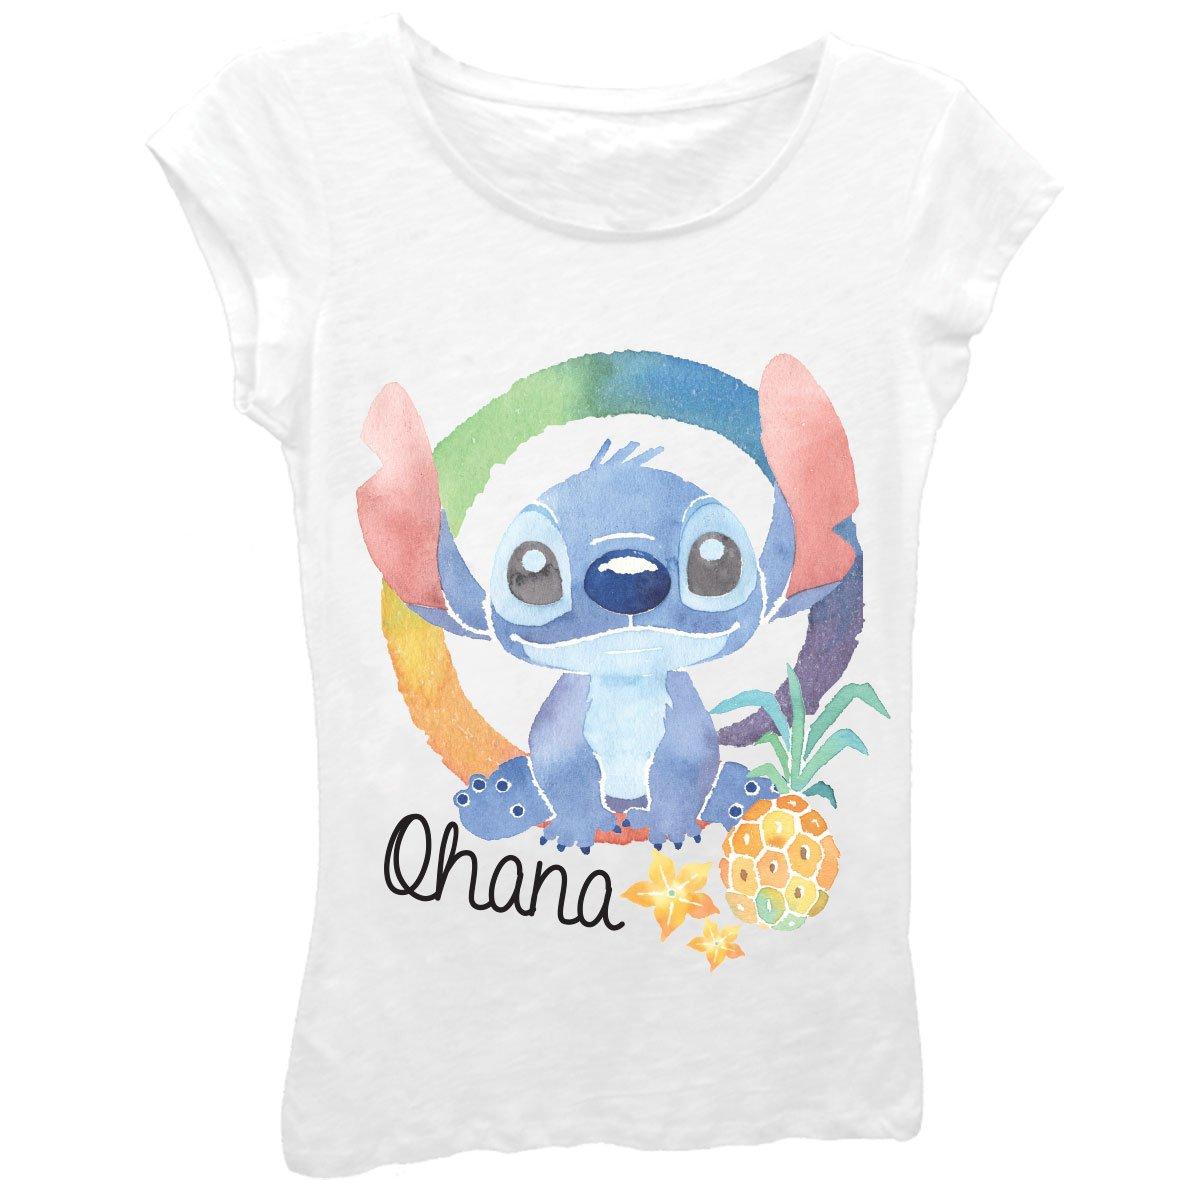 2984a8de0 Top1: Disney Girls\' Lilo Ohana Stitch Short Sleeve Tee